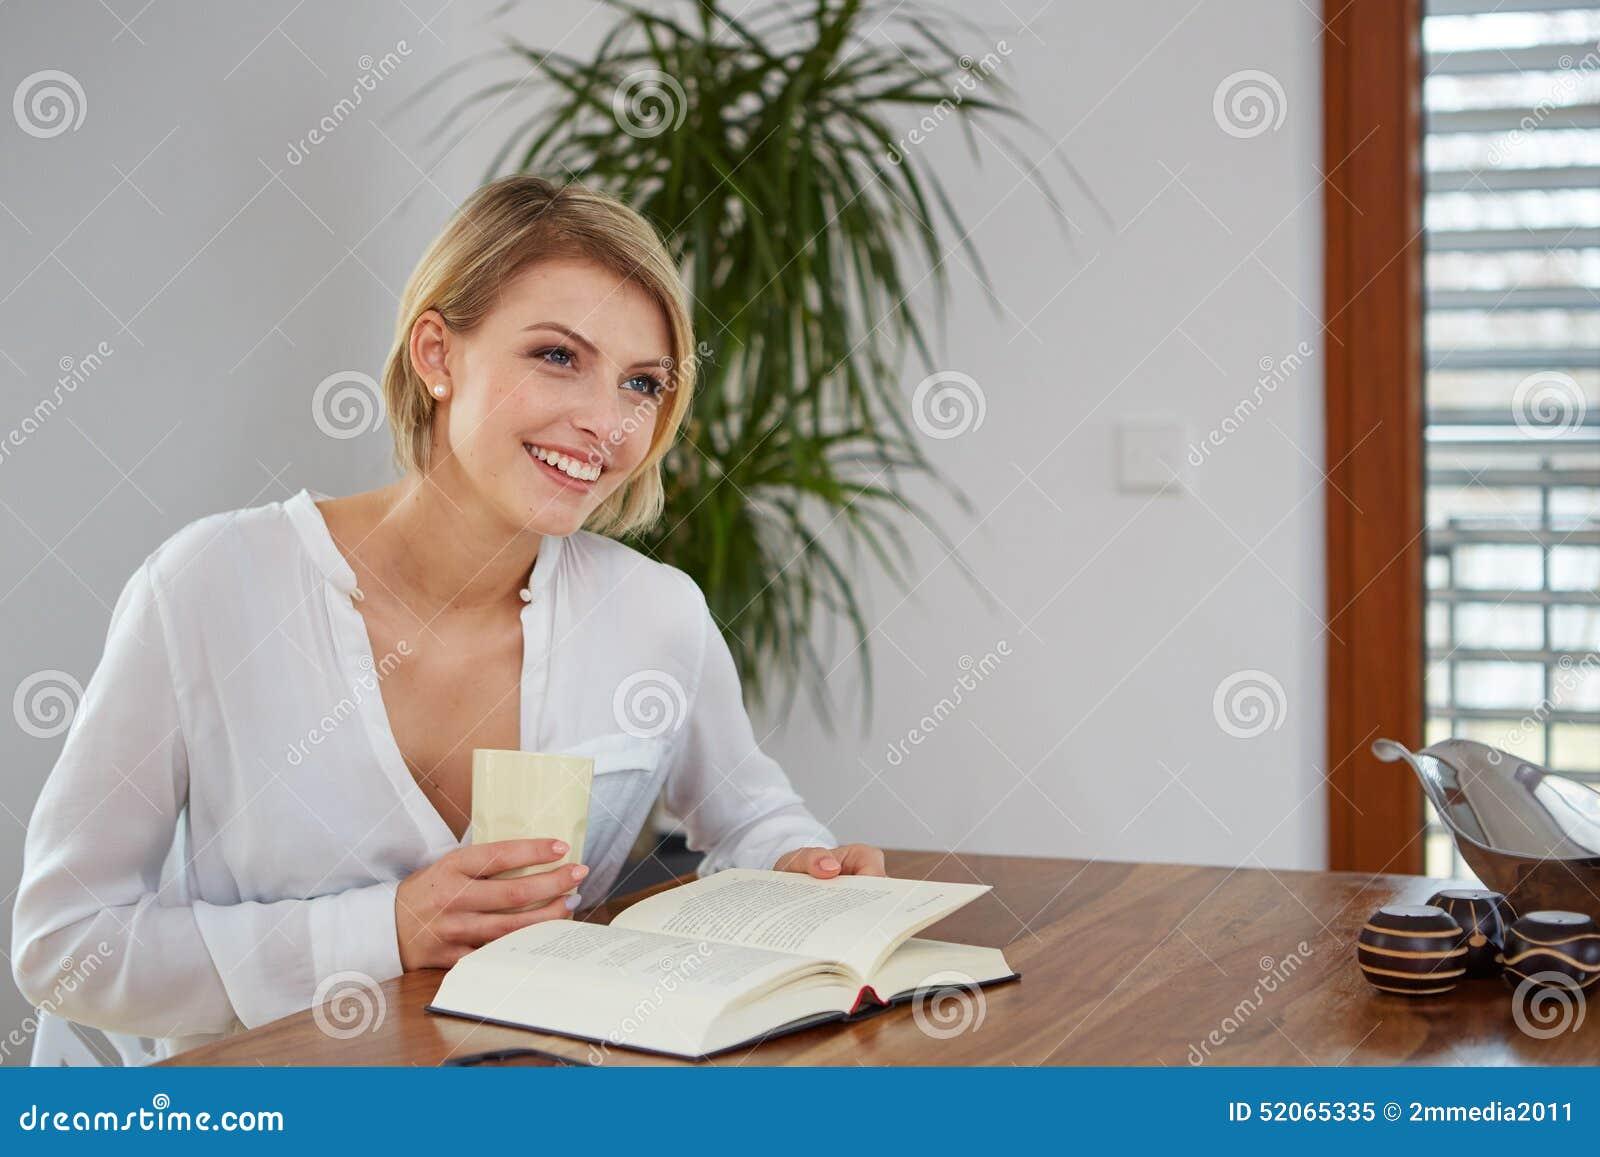 Beautiful woman reading her book